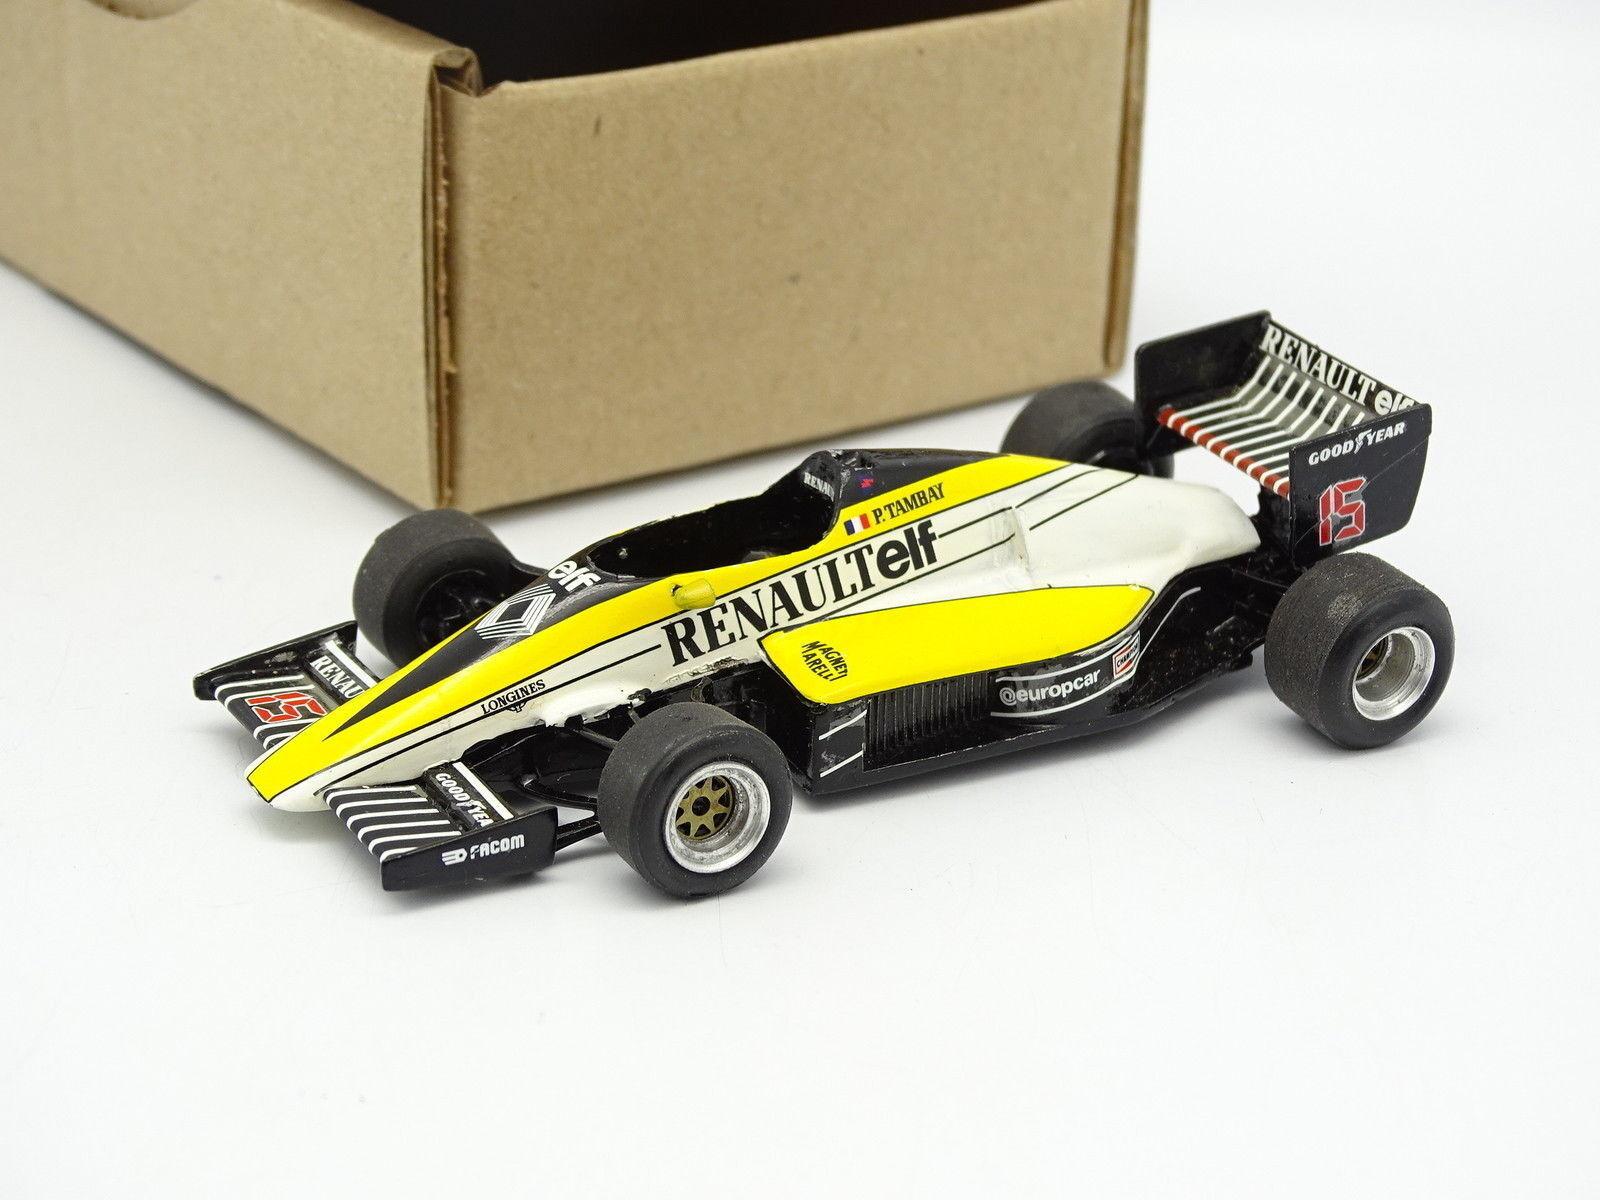 Meri Kit Montato 1 43 - F1 Renault RE 60 Portugal GP 1985 Tambay